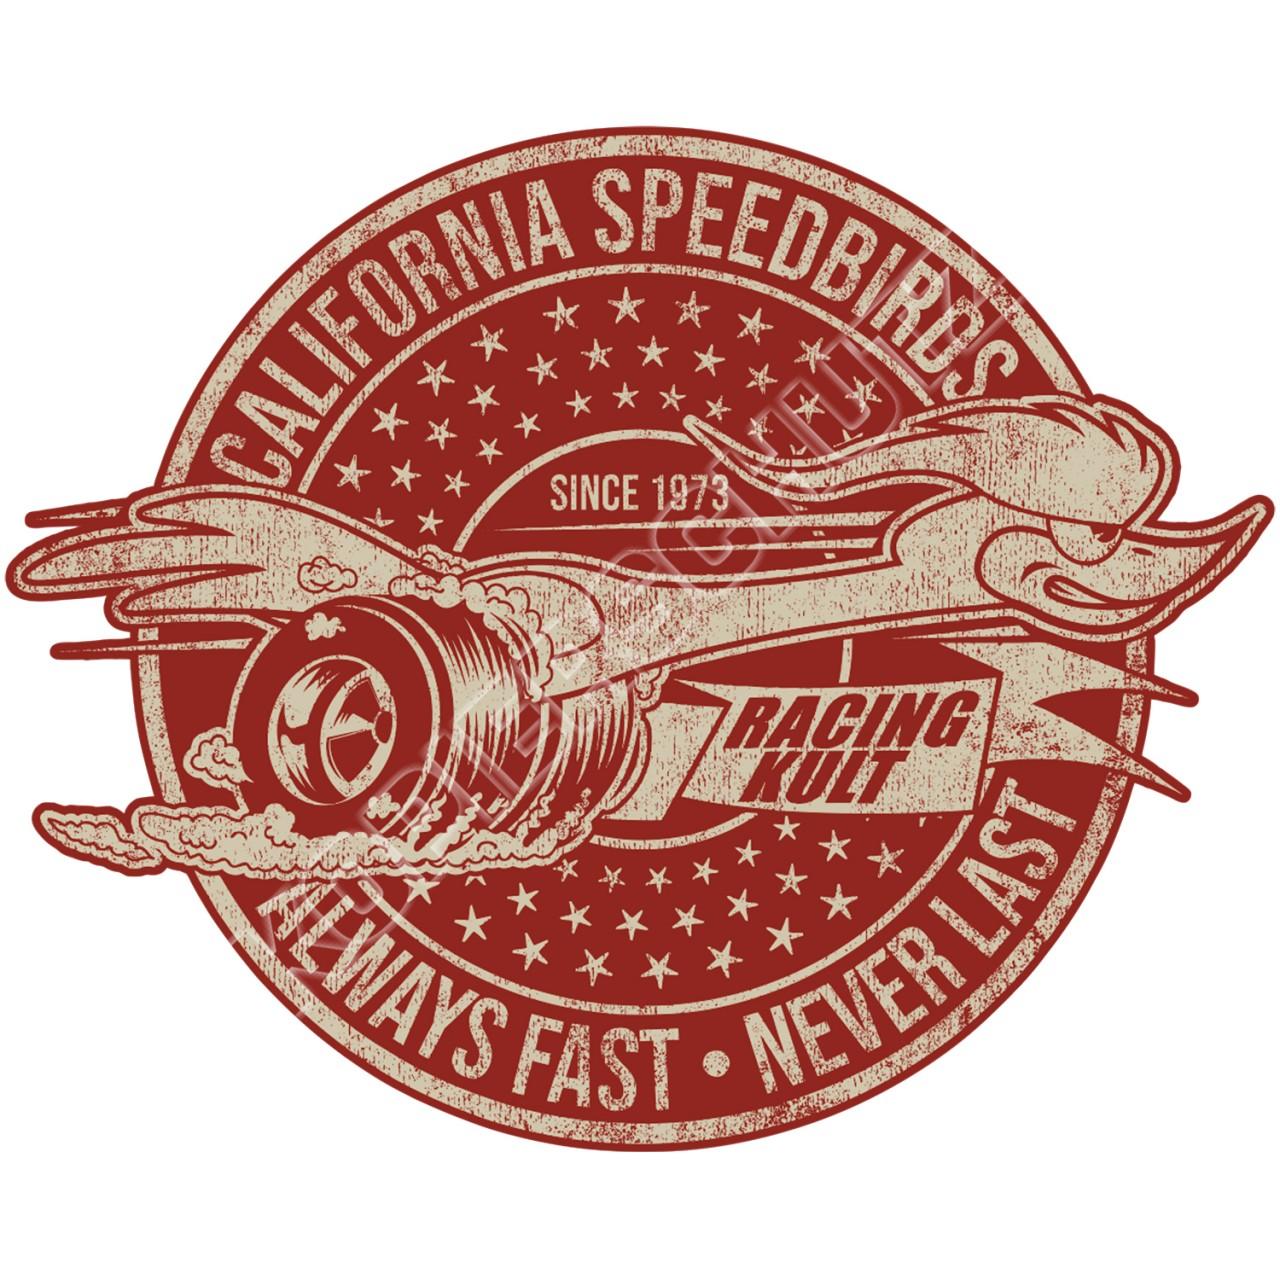 Racing Kult Aufkleber California Speedbirds Always Fast - Never Last Sticker in verschiedenen Größe